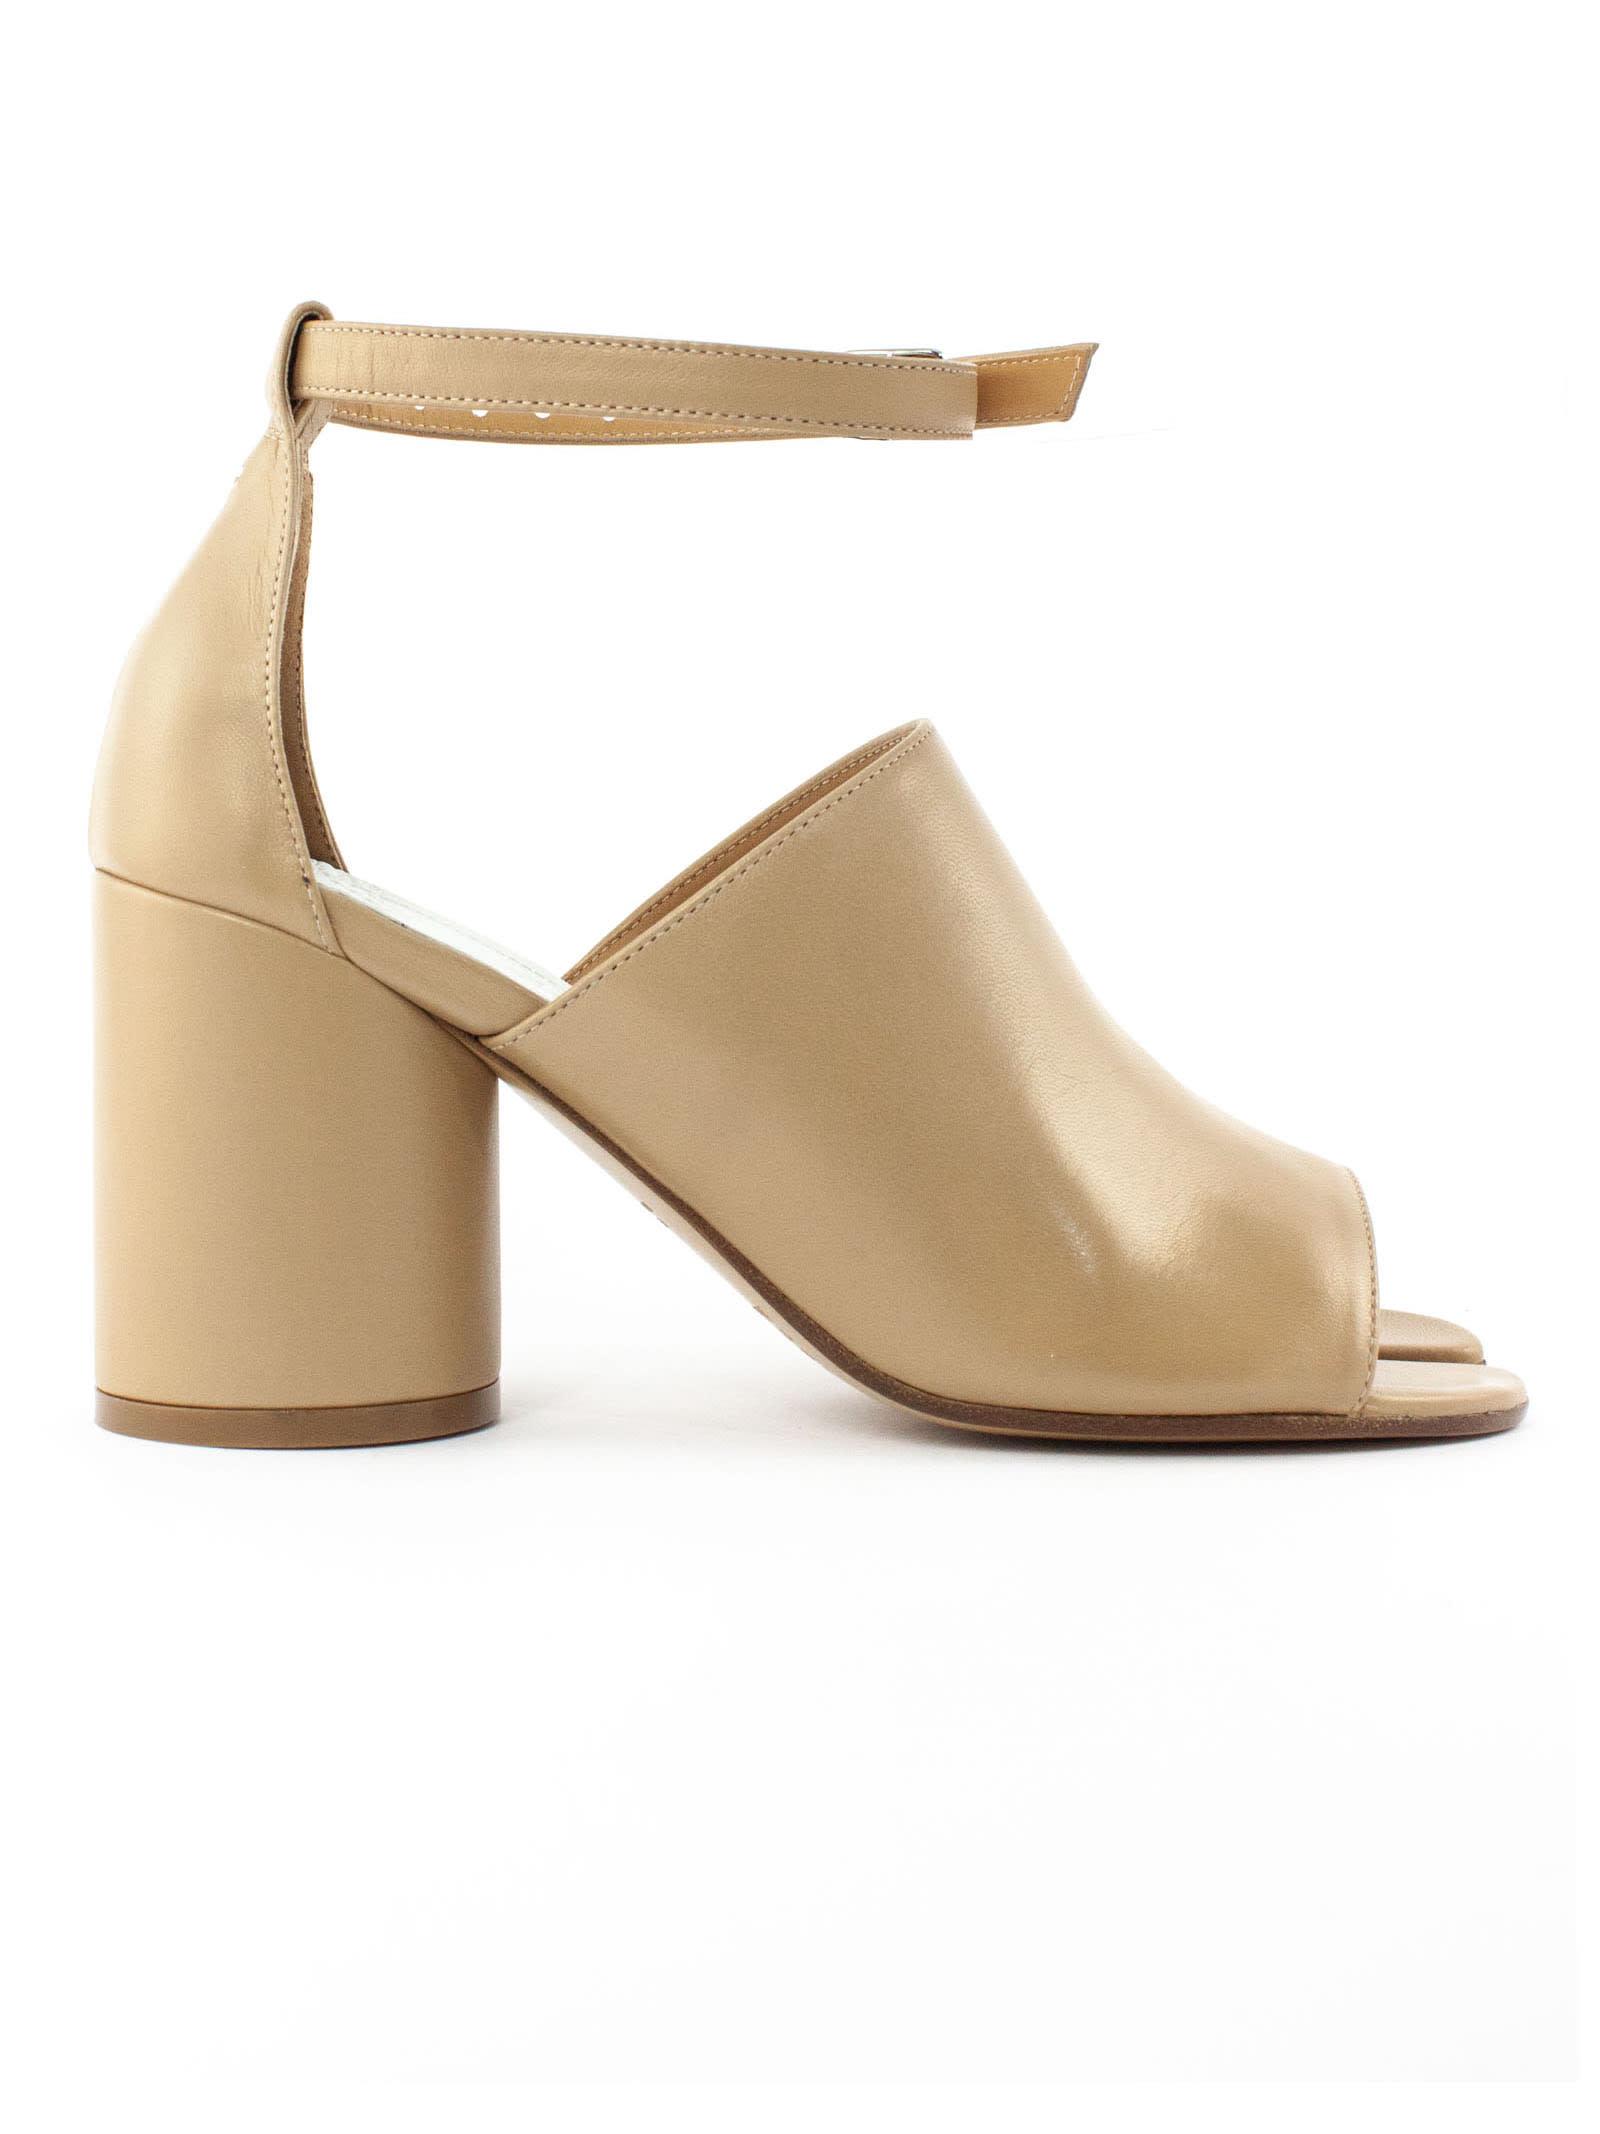 Buy Maison Margiela Beige Leather Open Tabi Toe Sandals online, shop Maison Margiela shoes with free shipping